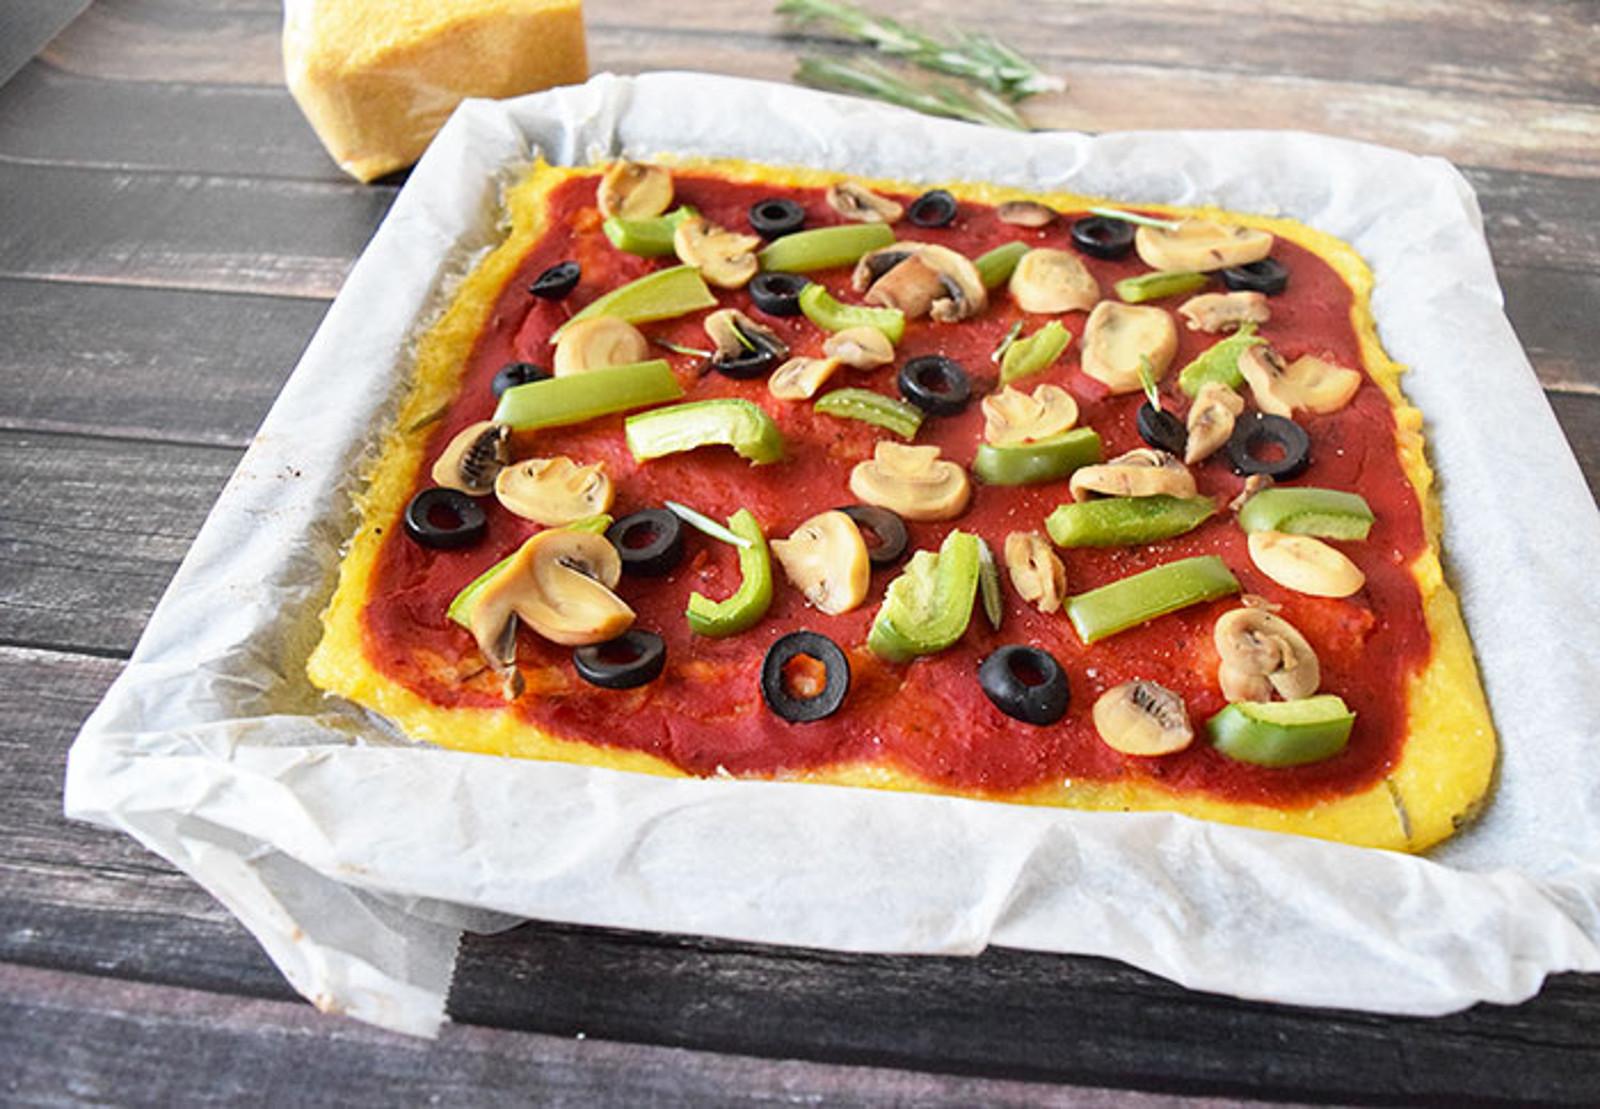 Healthy Polenta Pizza [Vegan, Gluten-Free]